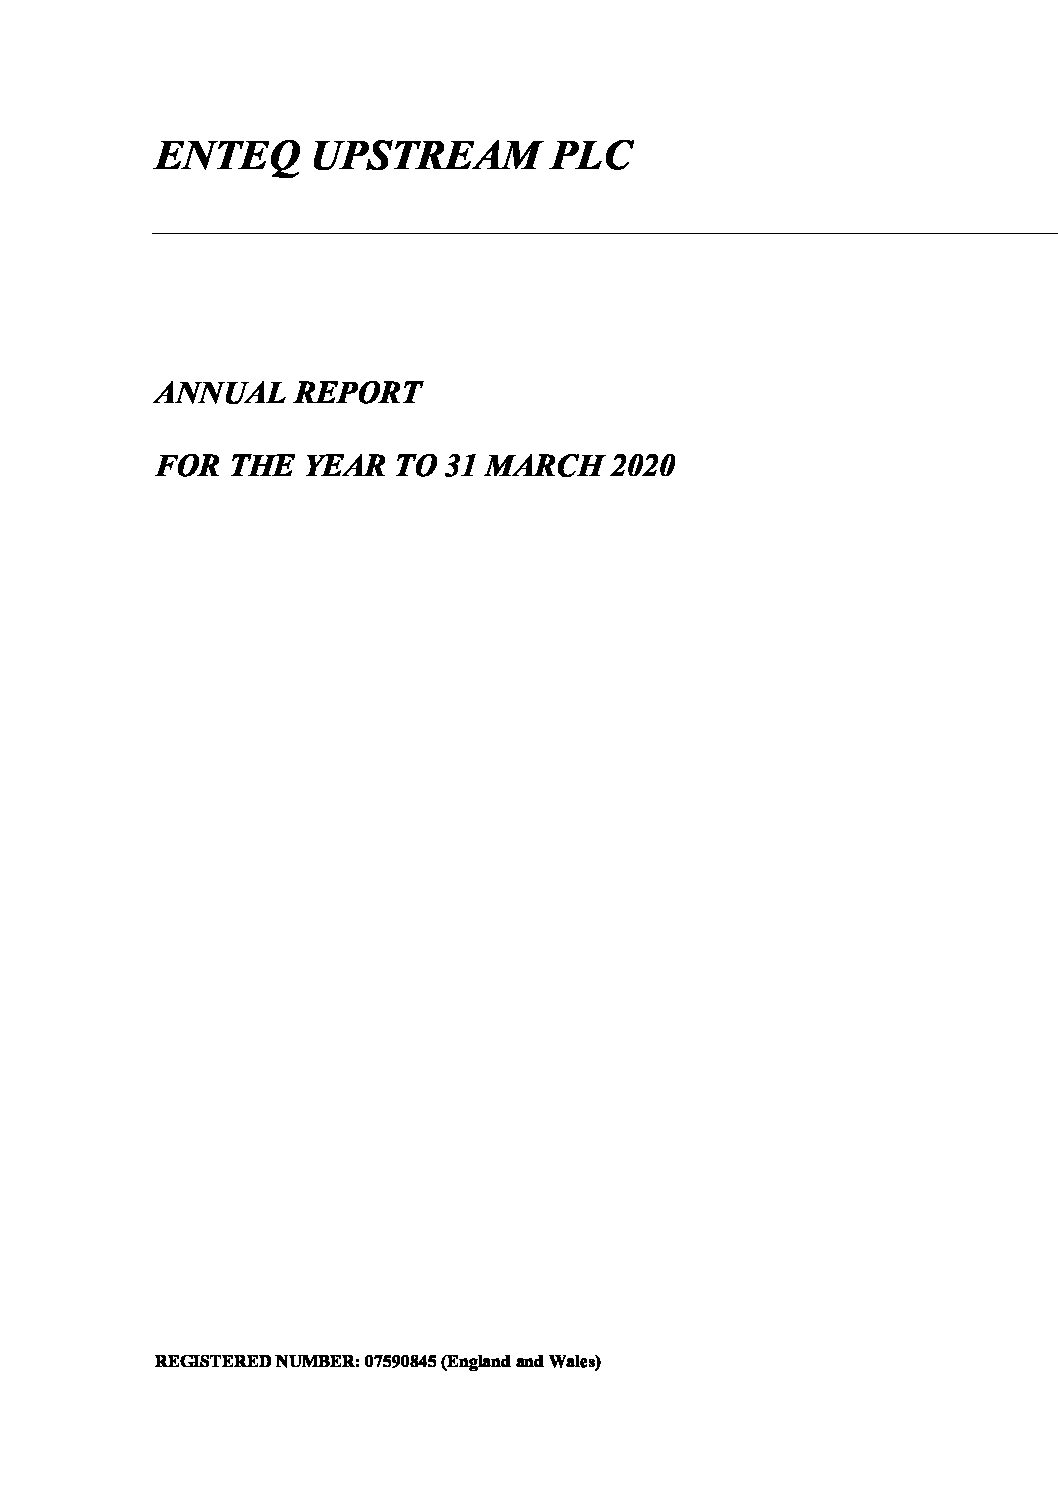 Annual Report – 31 March 2020